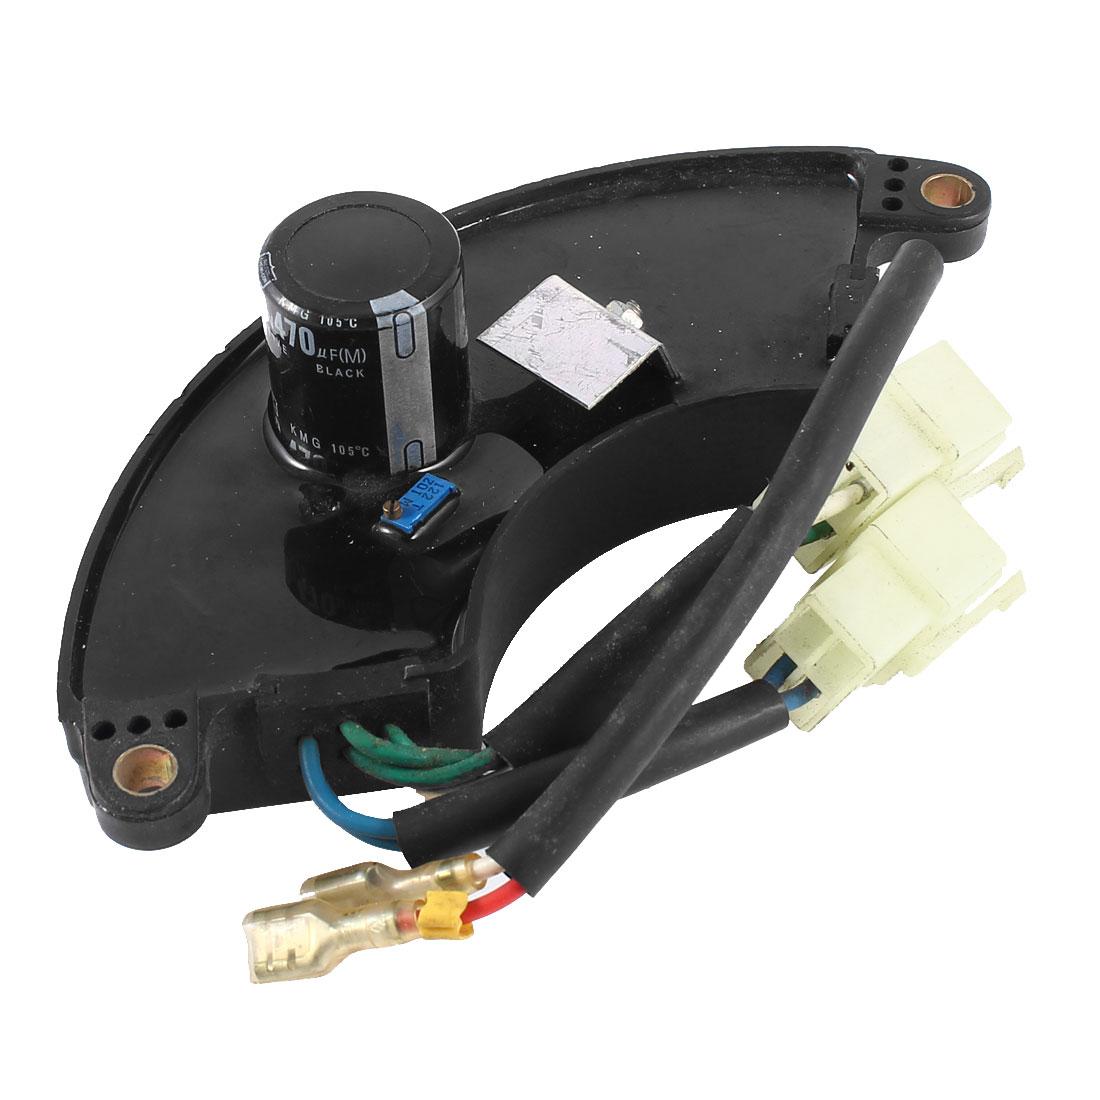 Motorcycle Generator 6.5KW 470uF 250V Regulator Capacitor Black